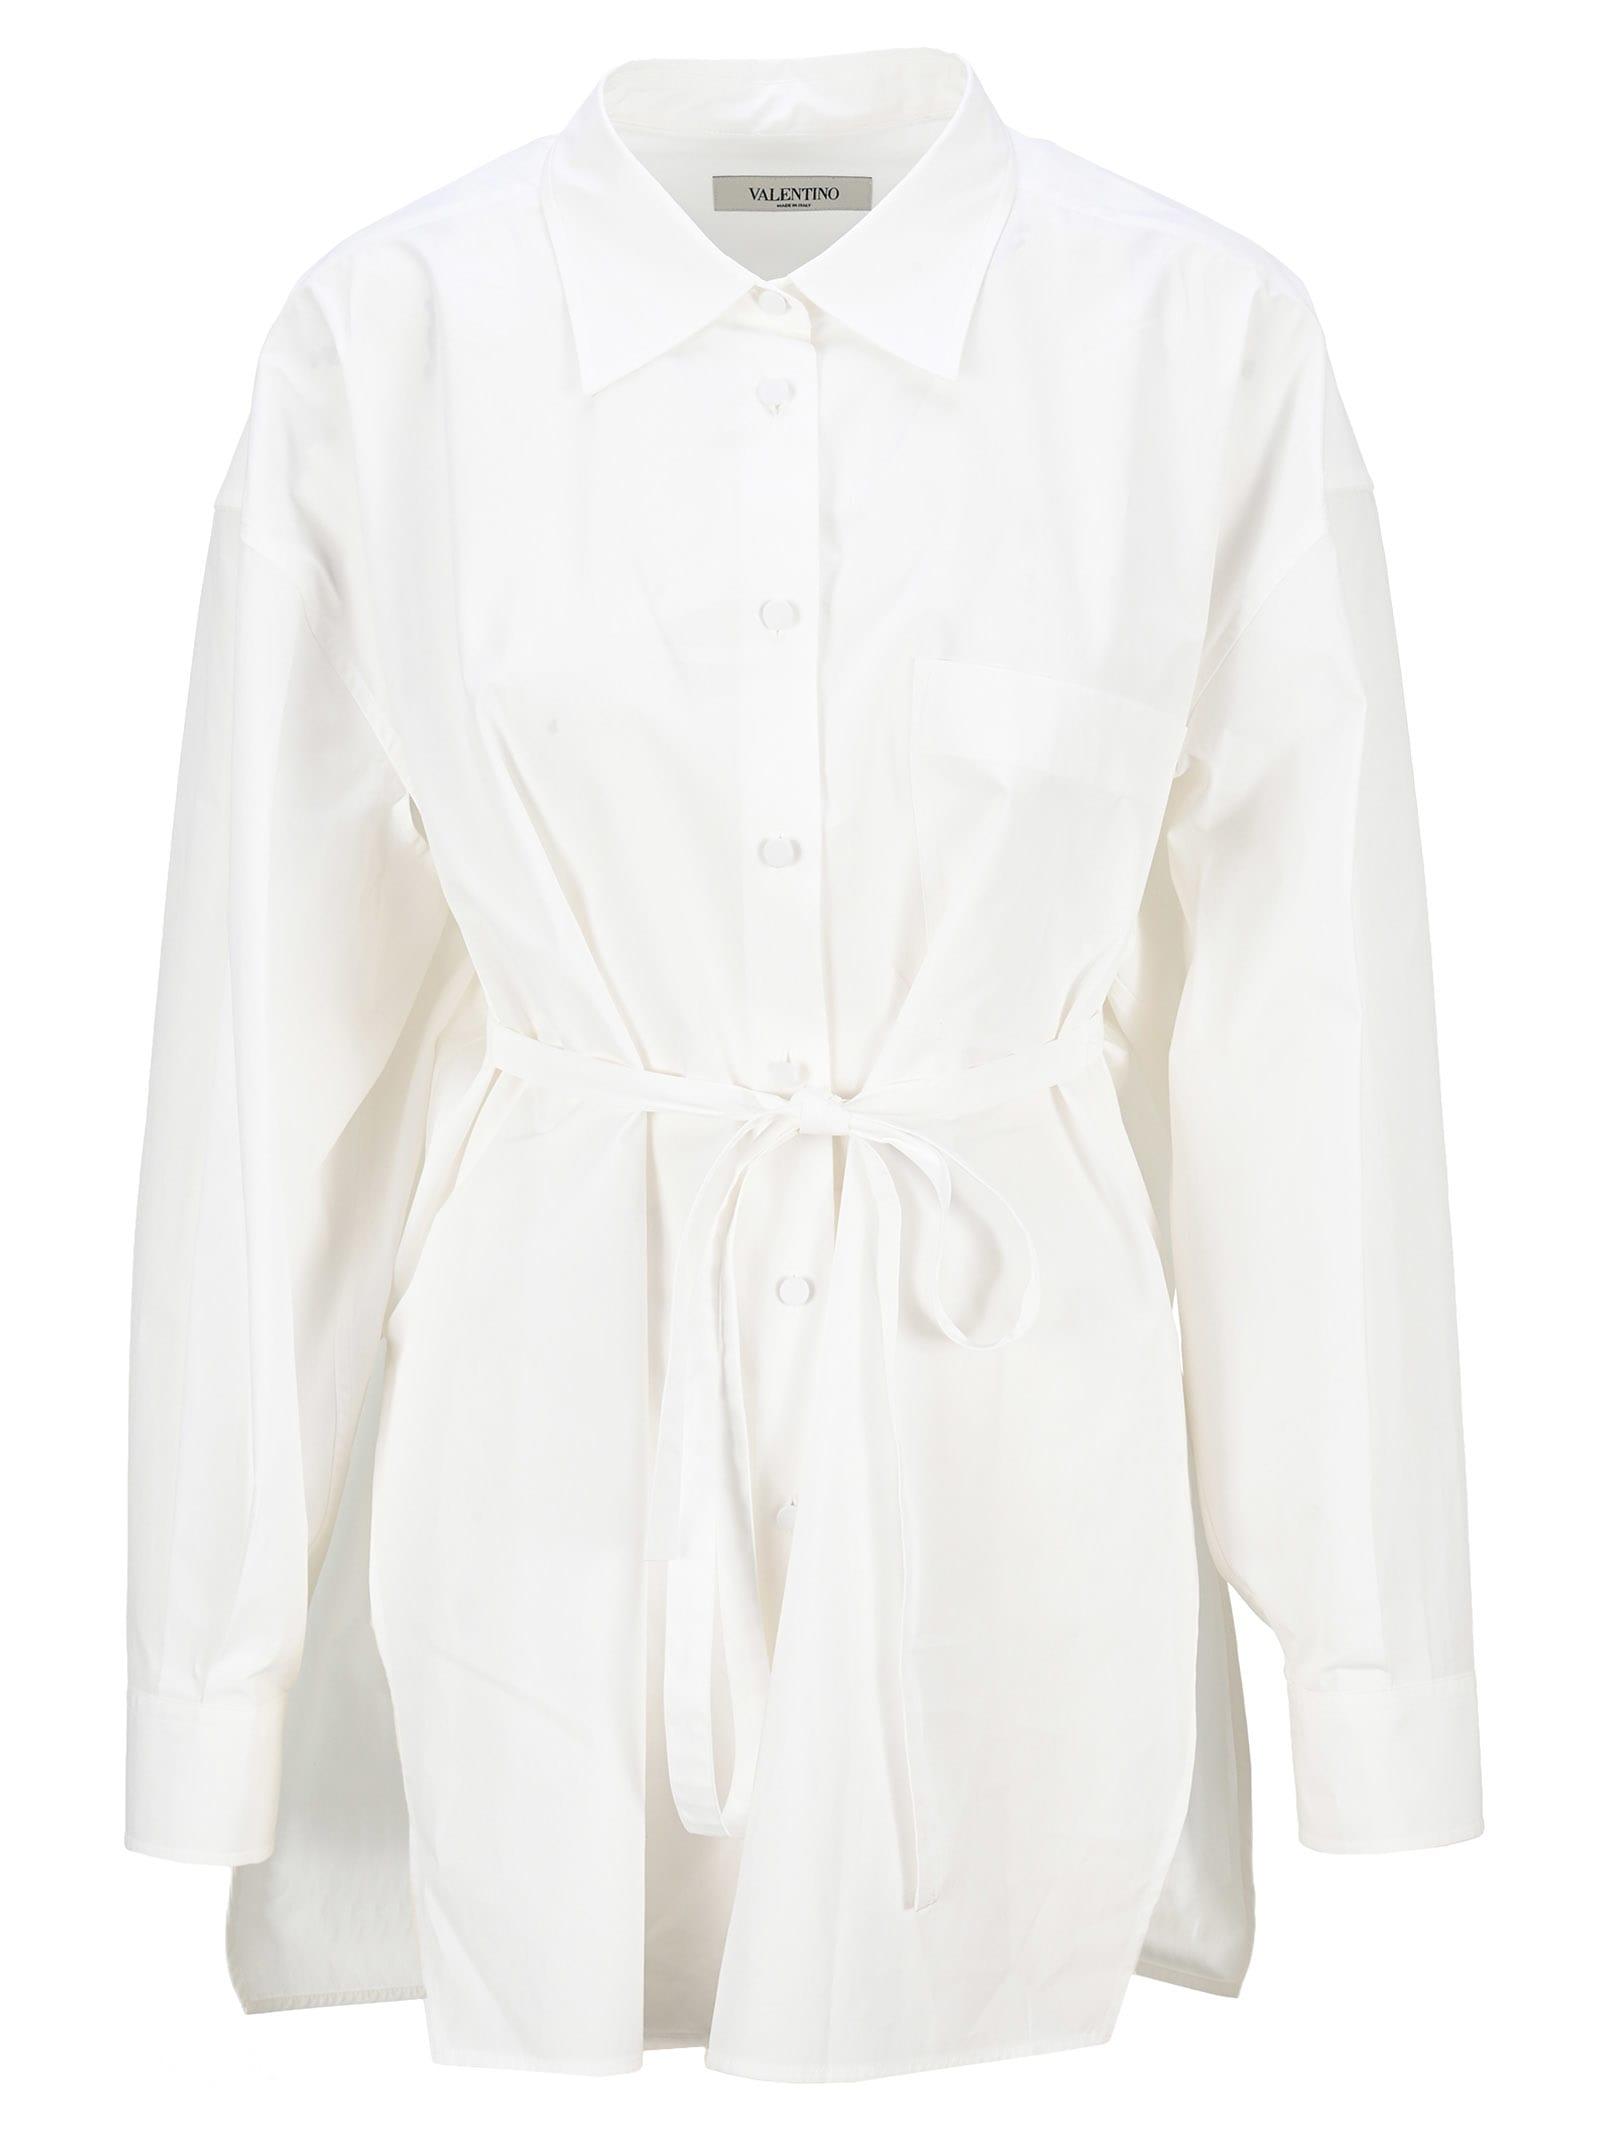 Valentino Oversize Cotton Poplin Shirt